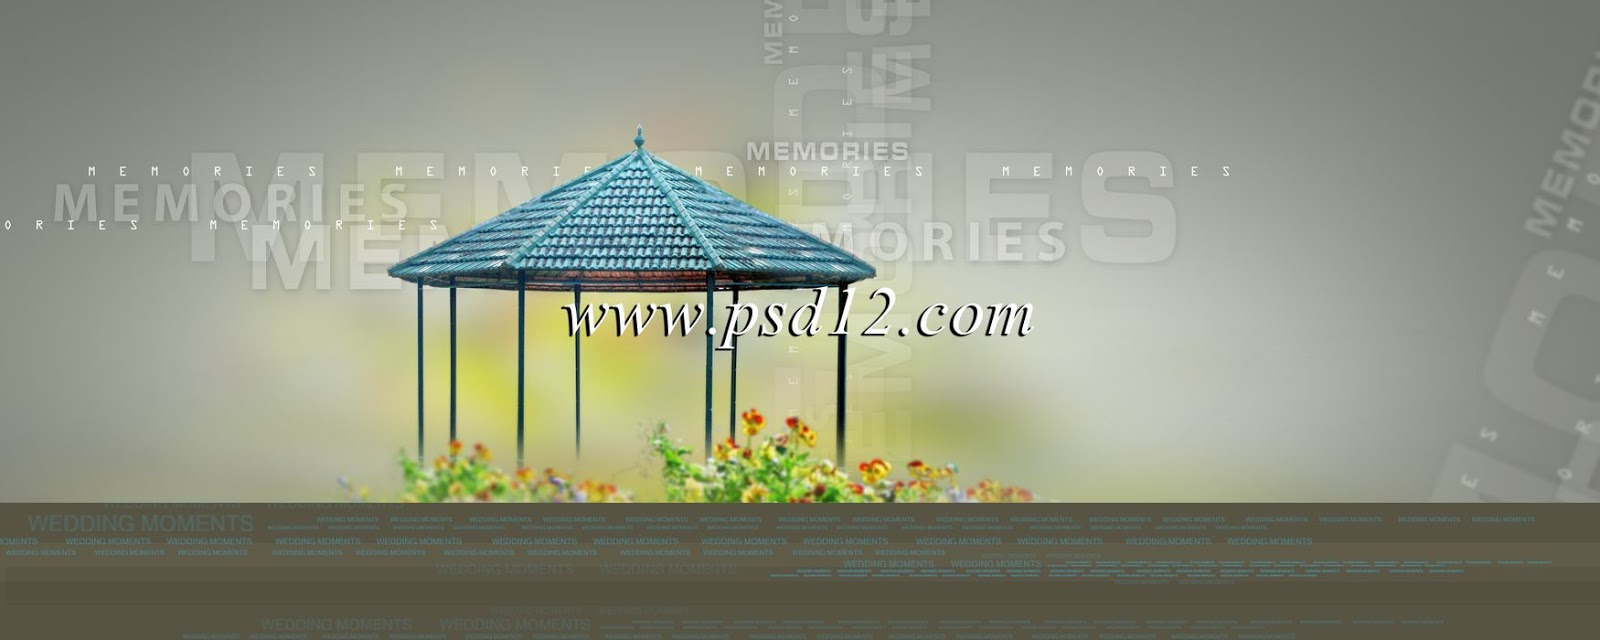 Karizma Album Background Psd Download Full Version Pic #14